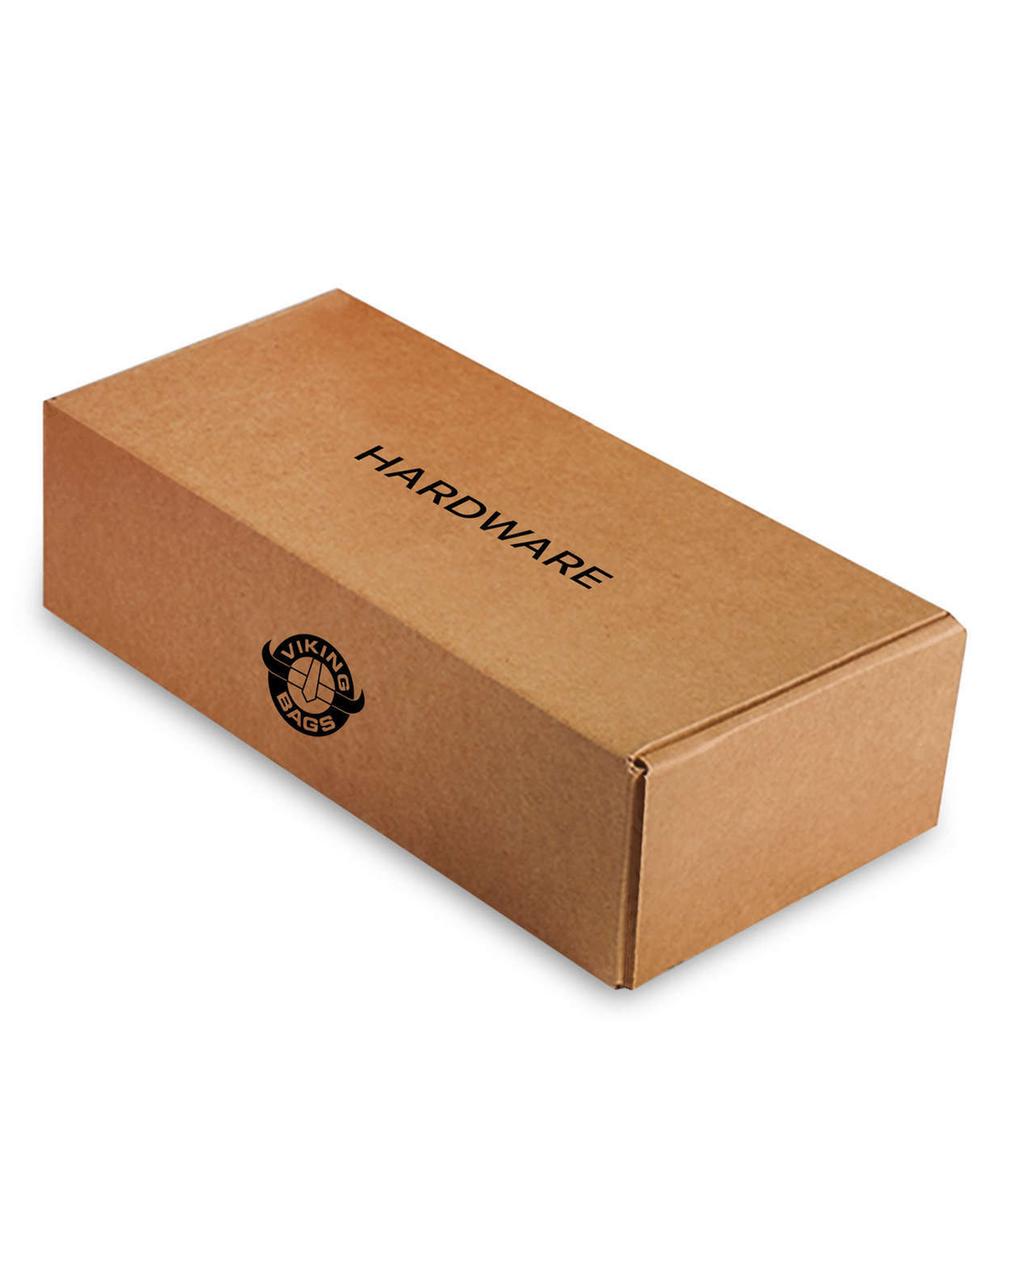 Honda VTX 1800 F Charger Braided Motorcycle Saddlebags Hardware Box